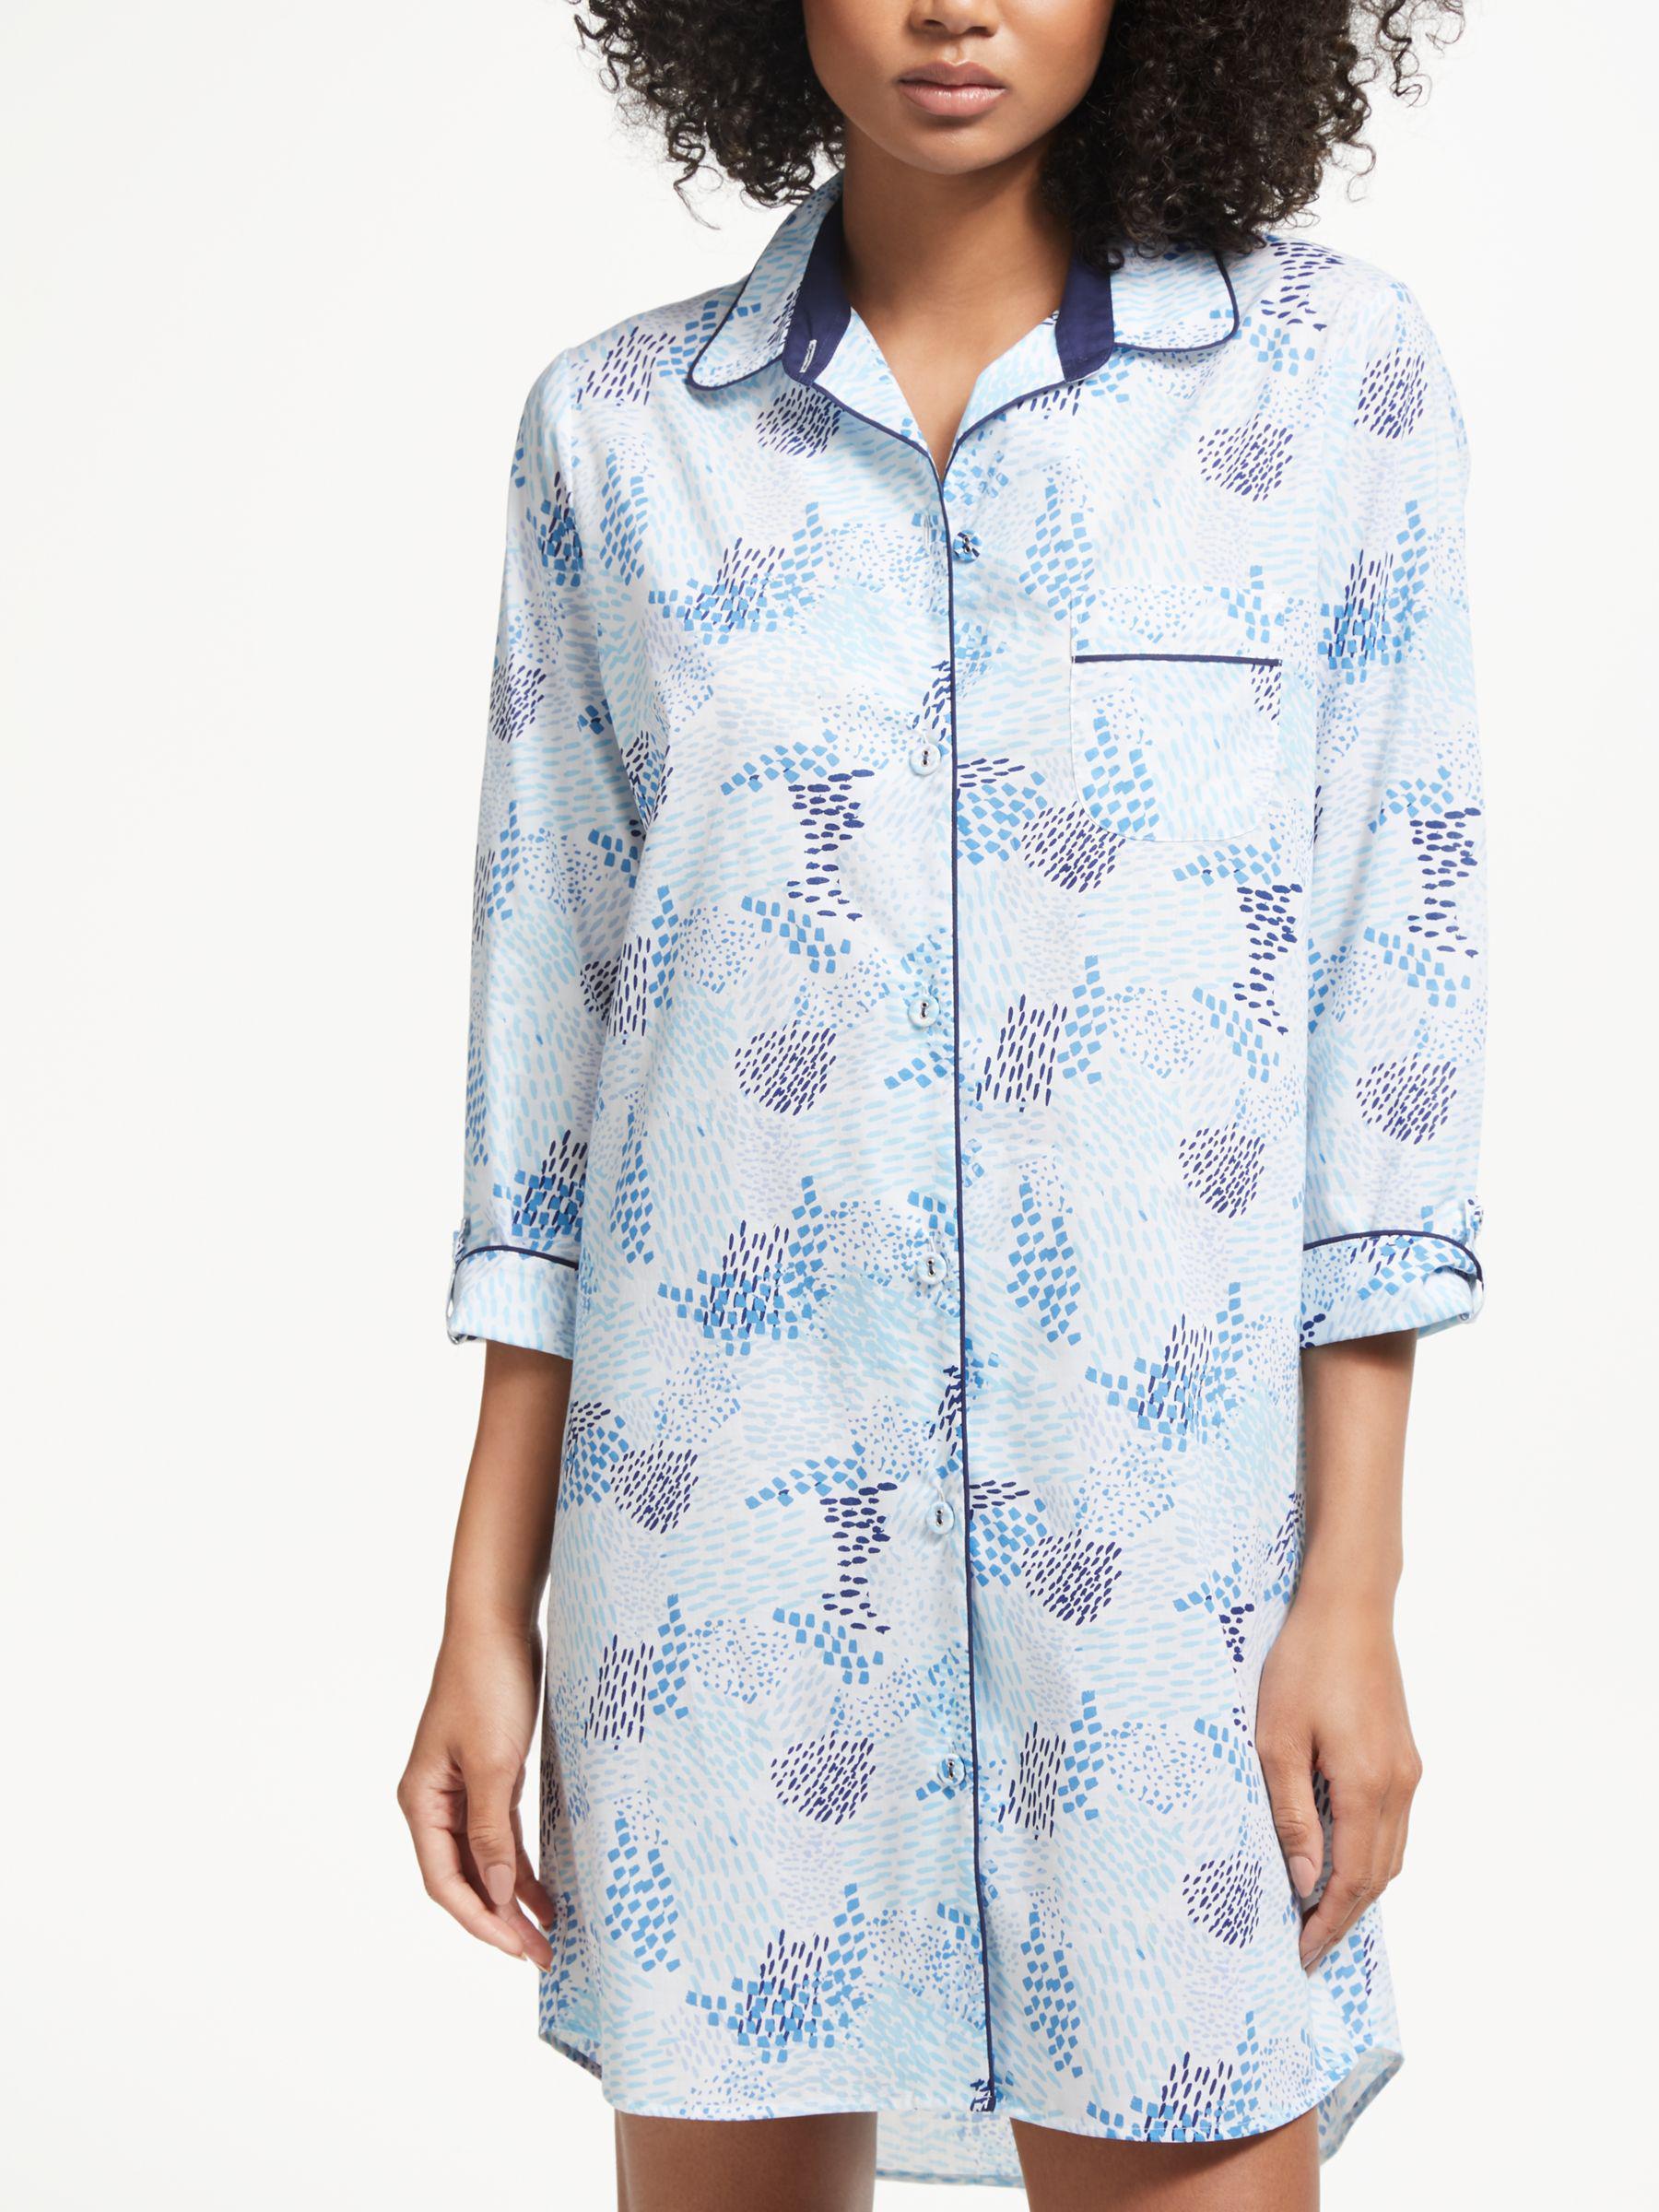 1bf9cbe755 John Lewis Shola Cotton Nightshirt in Blue - Lyst